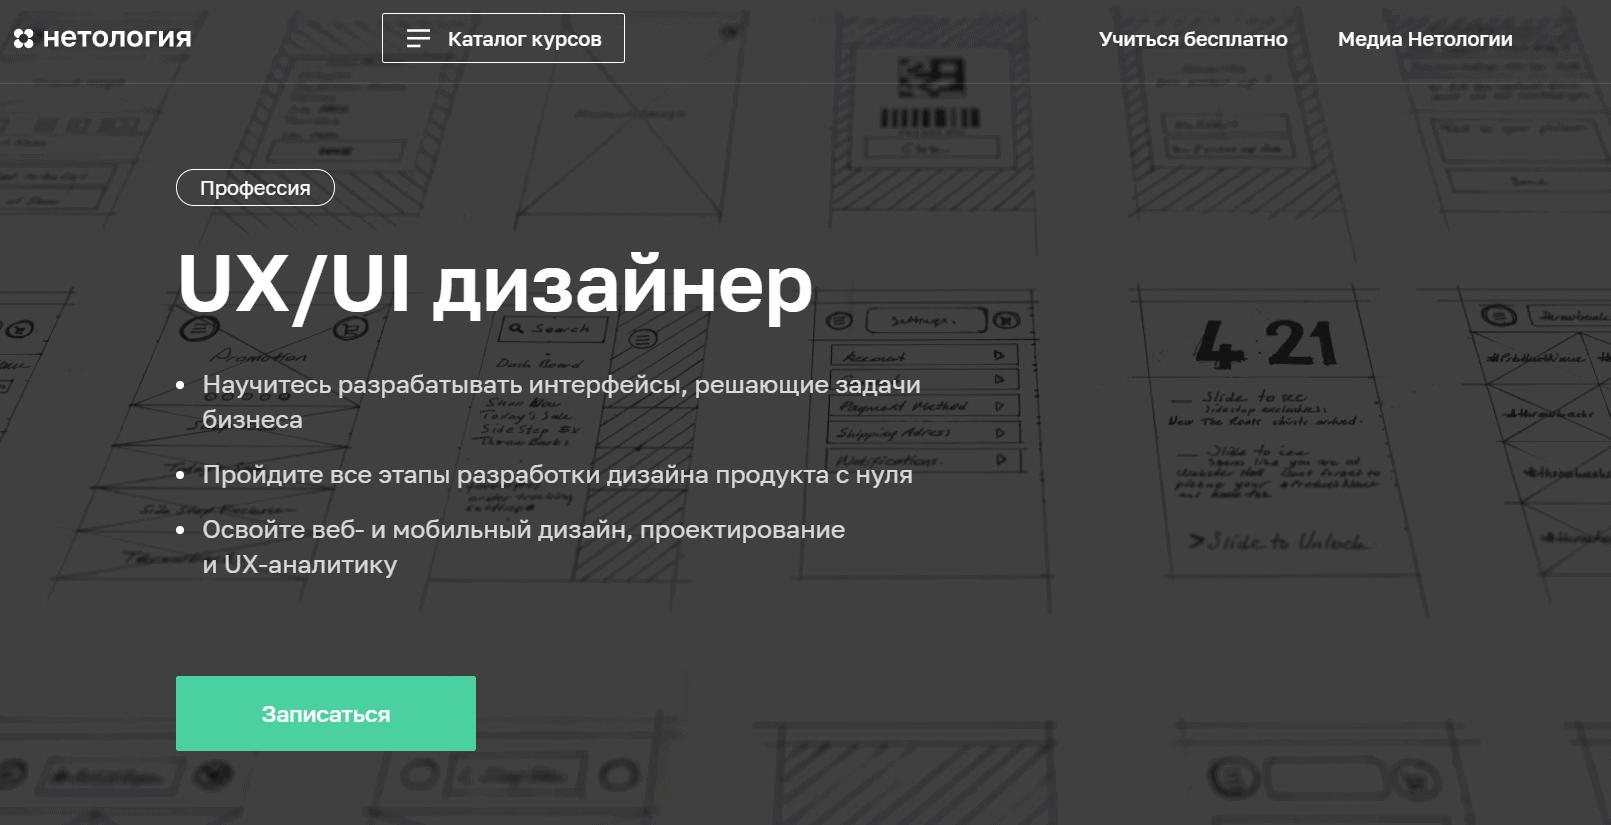 Онлайн-курс UX/UI дизайнер